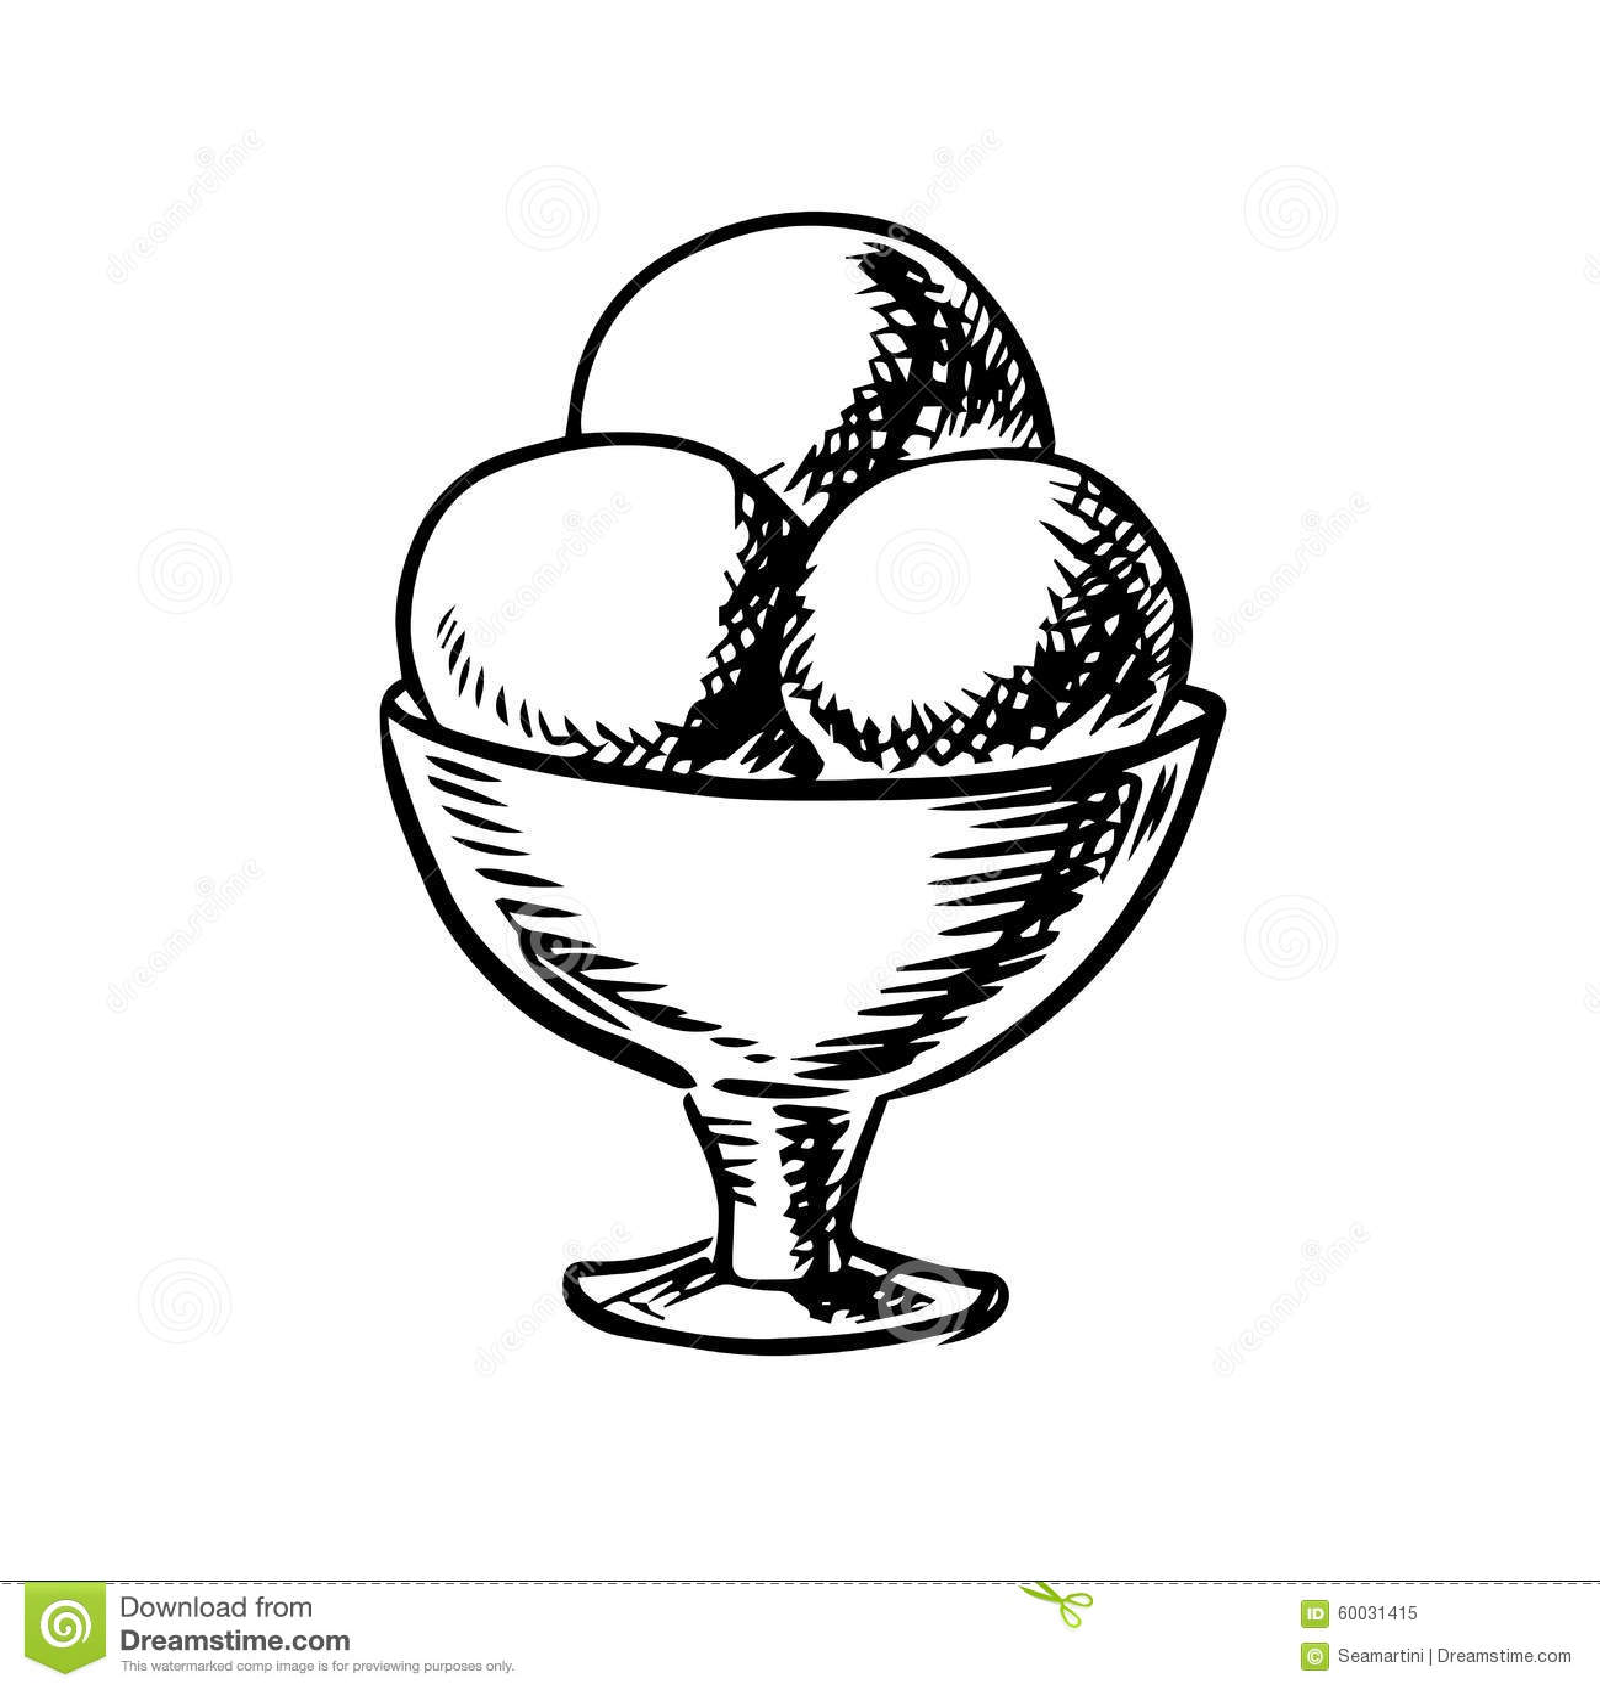 Sketch Of Ice Cream Scoops In Sundae Bowl Stock Vector